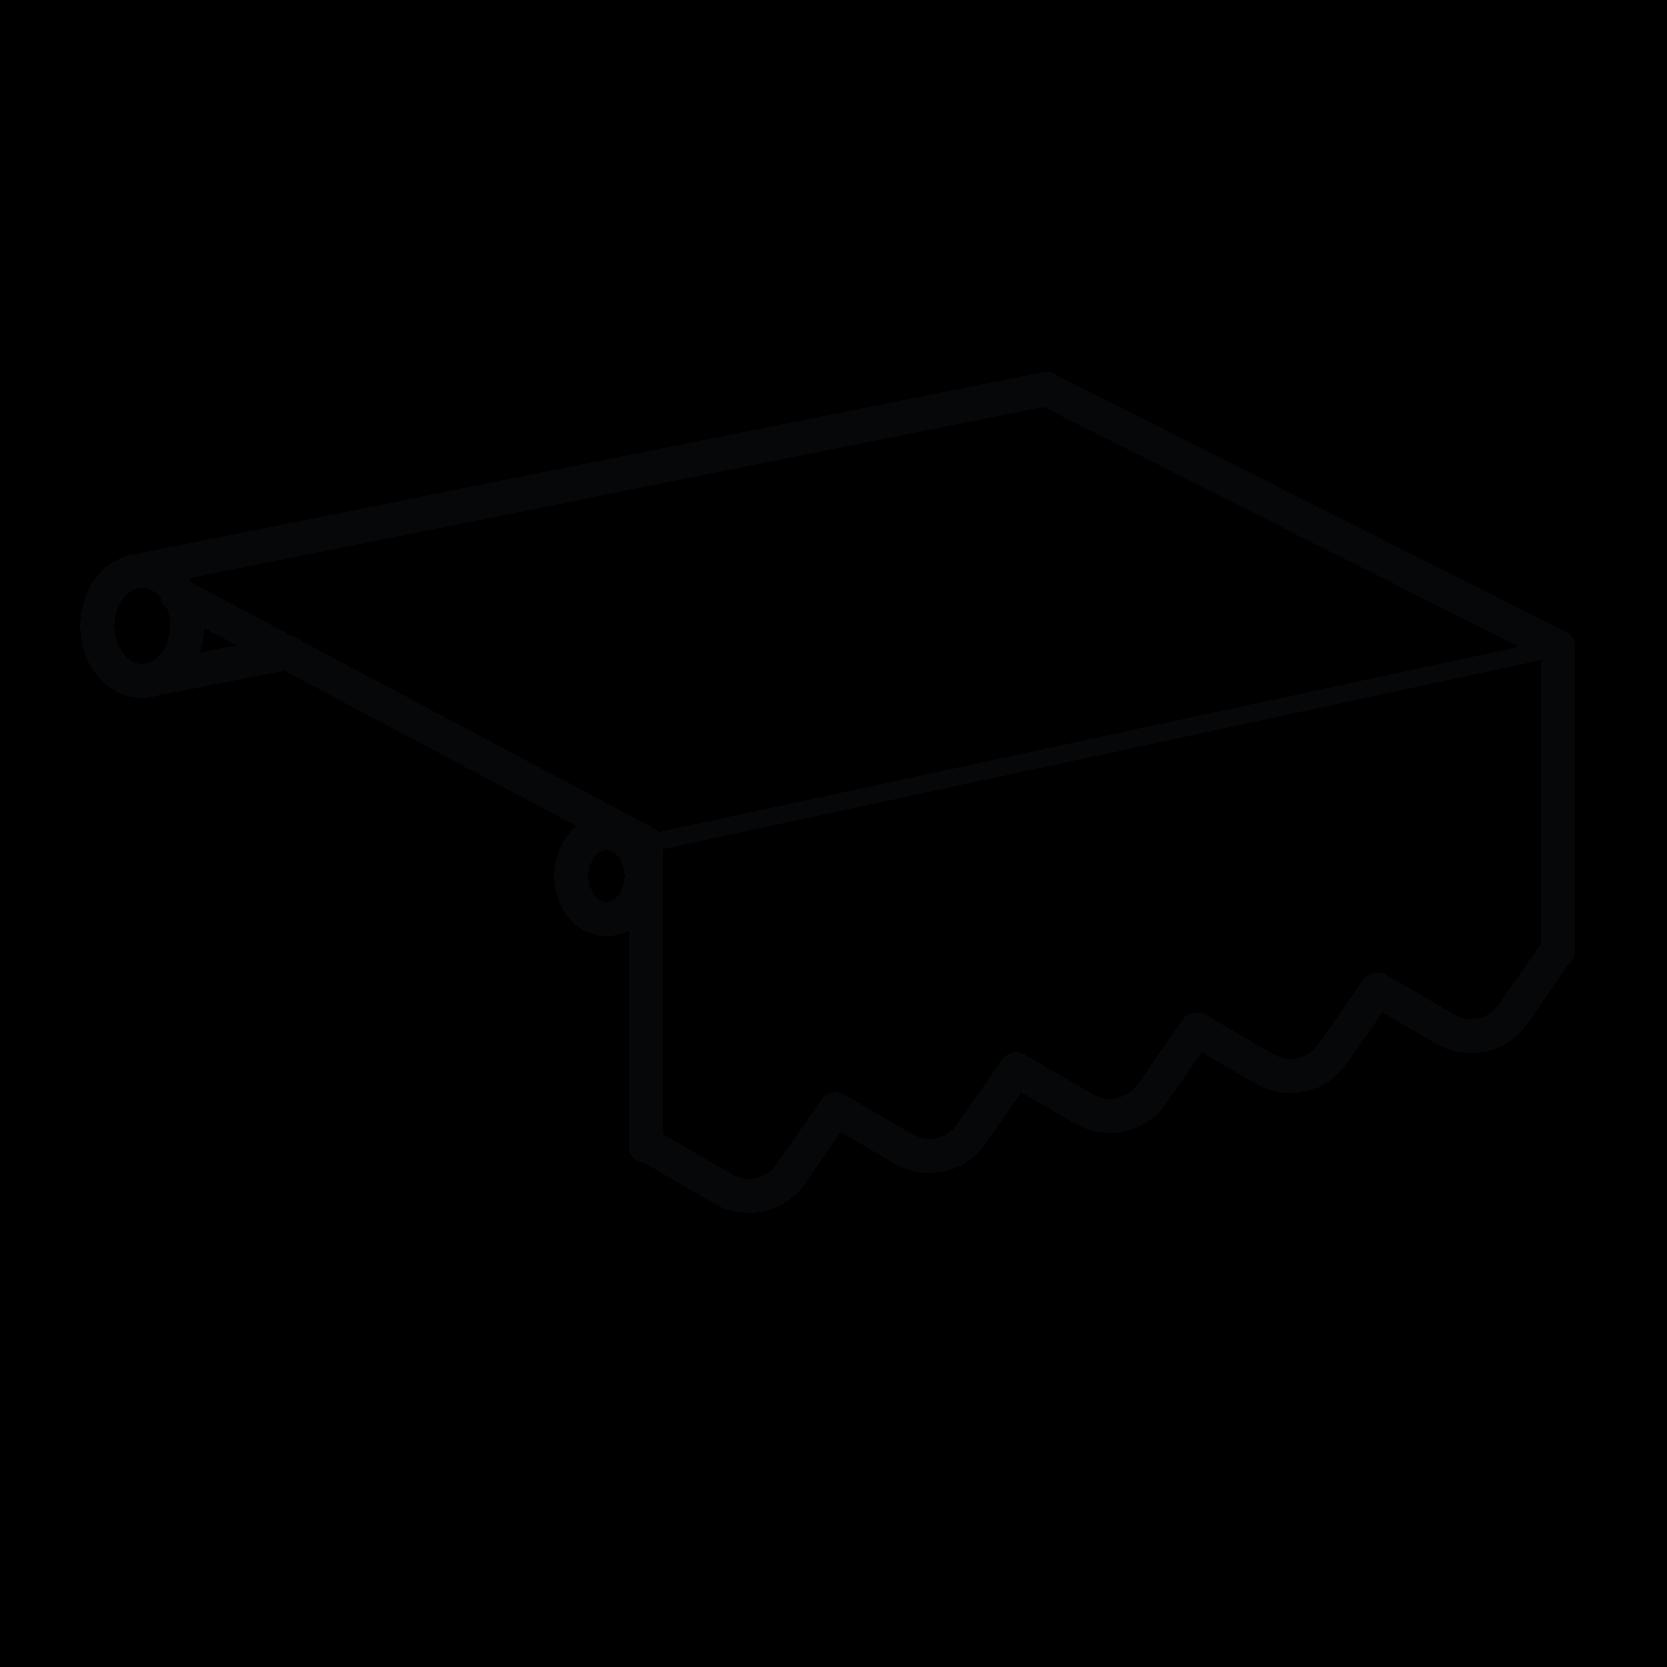 Terrassemarkise - Ikone